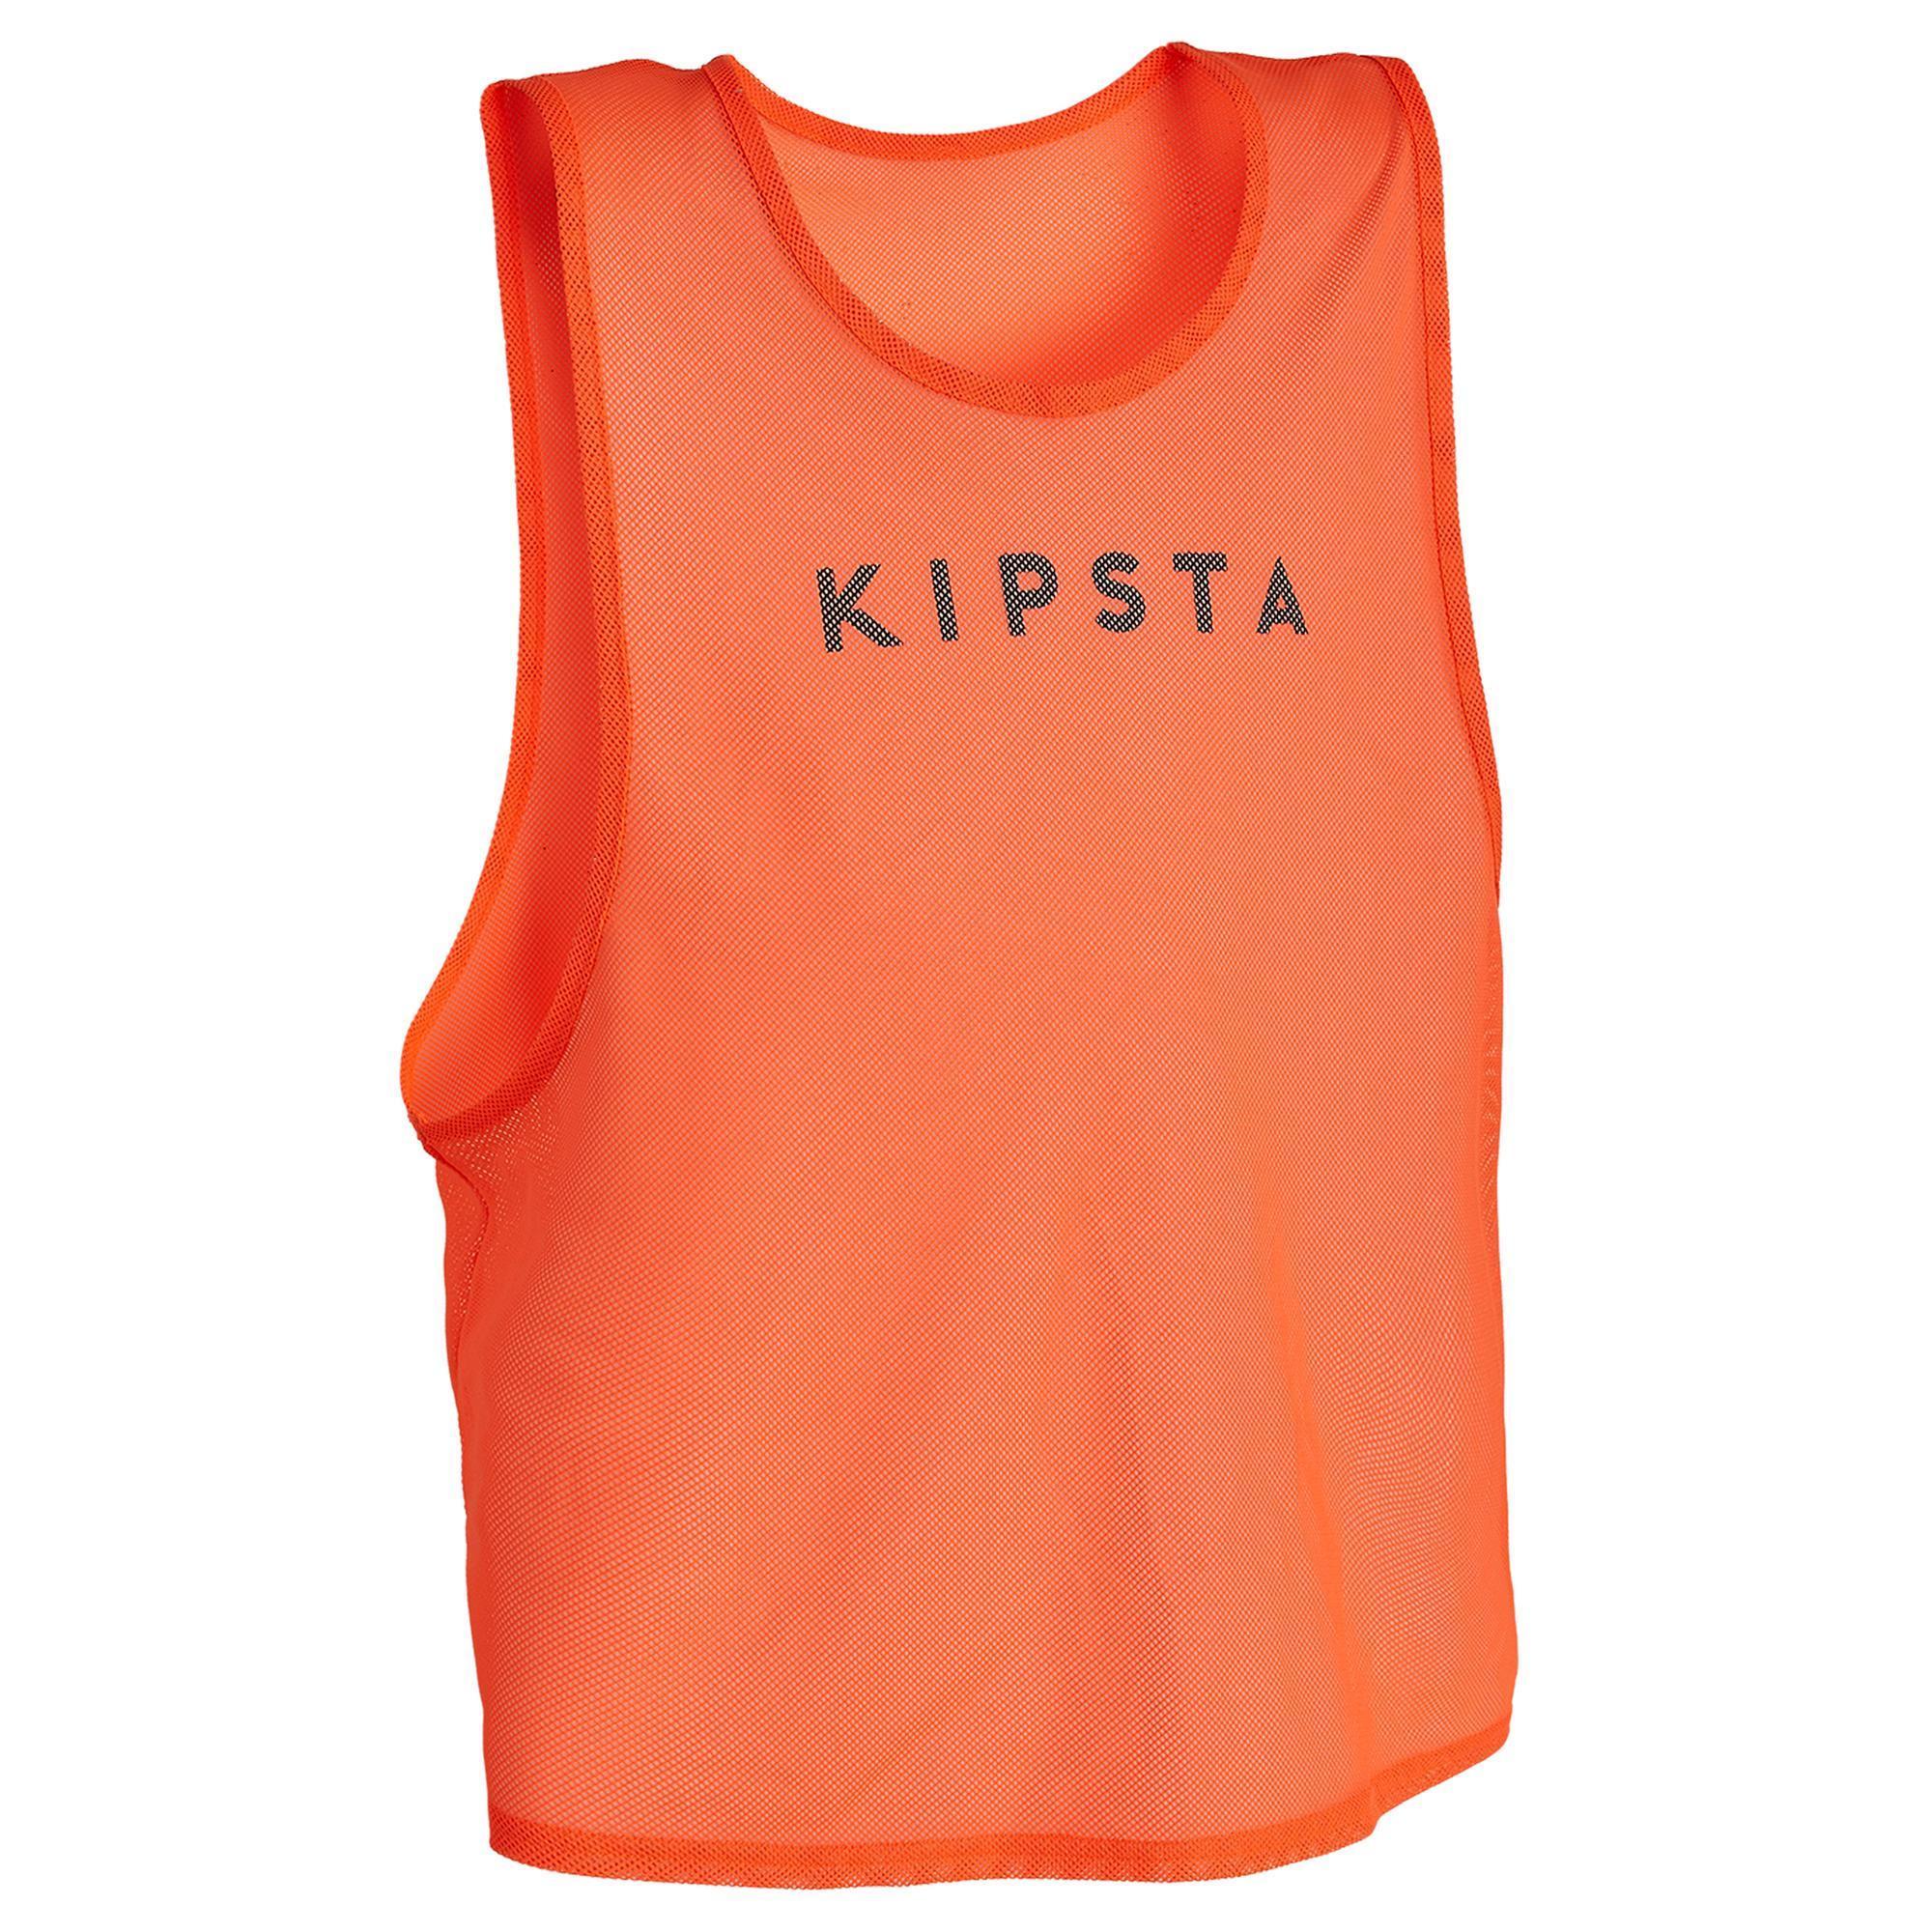 KIPSTA. Pettorina adulto arancione fljuo